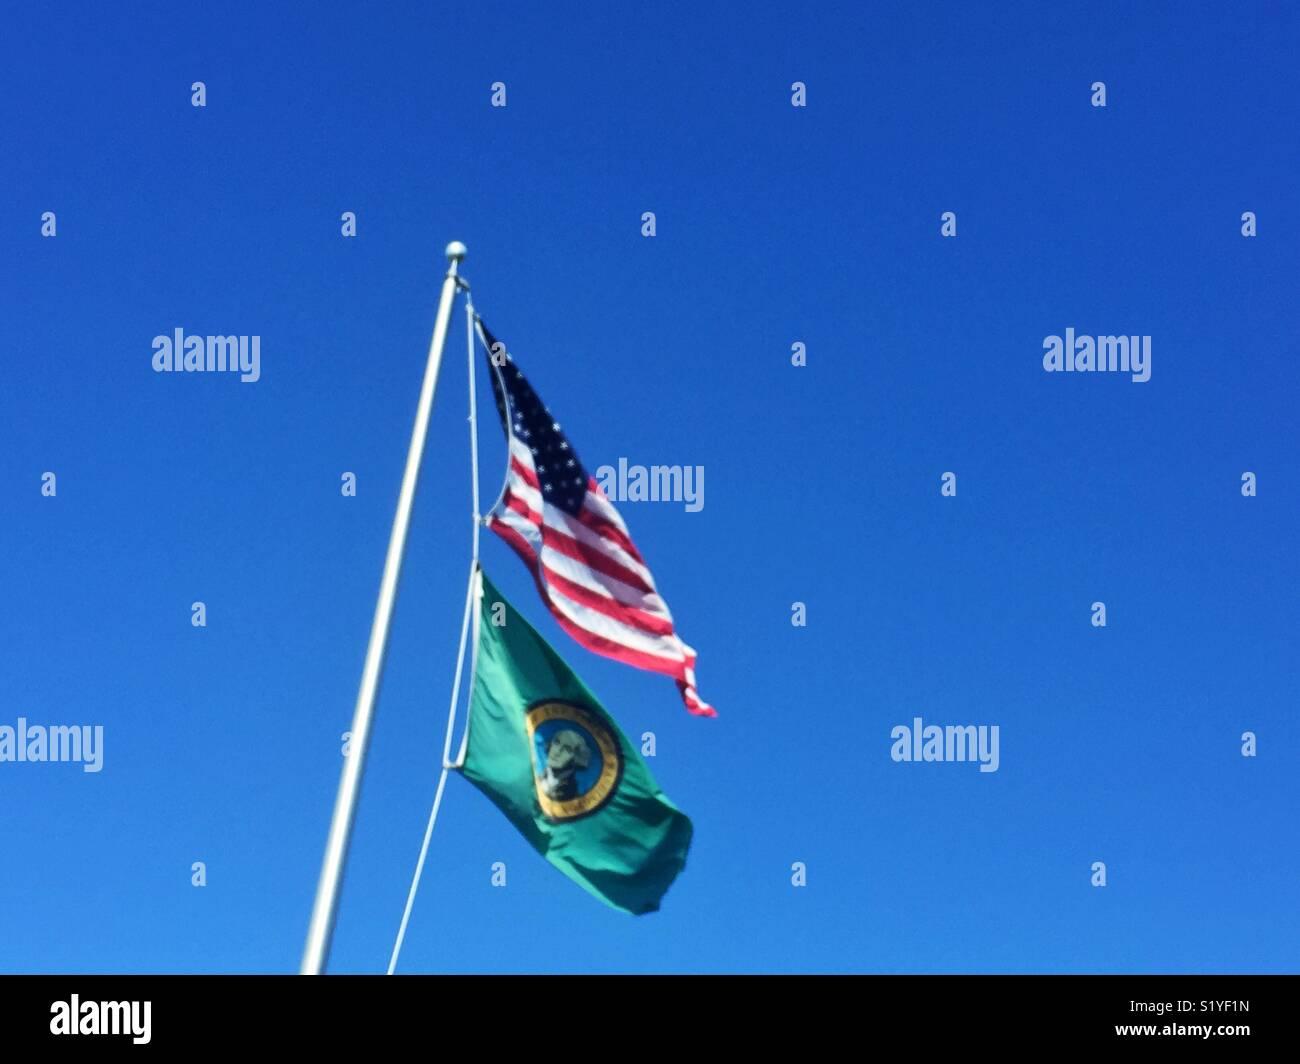 Moderno Colorear Bandera De Estado De Idaho Cresta - Dibujos Para ...